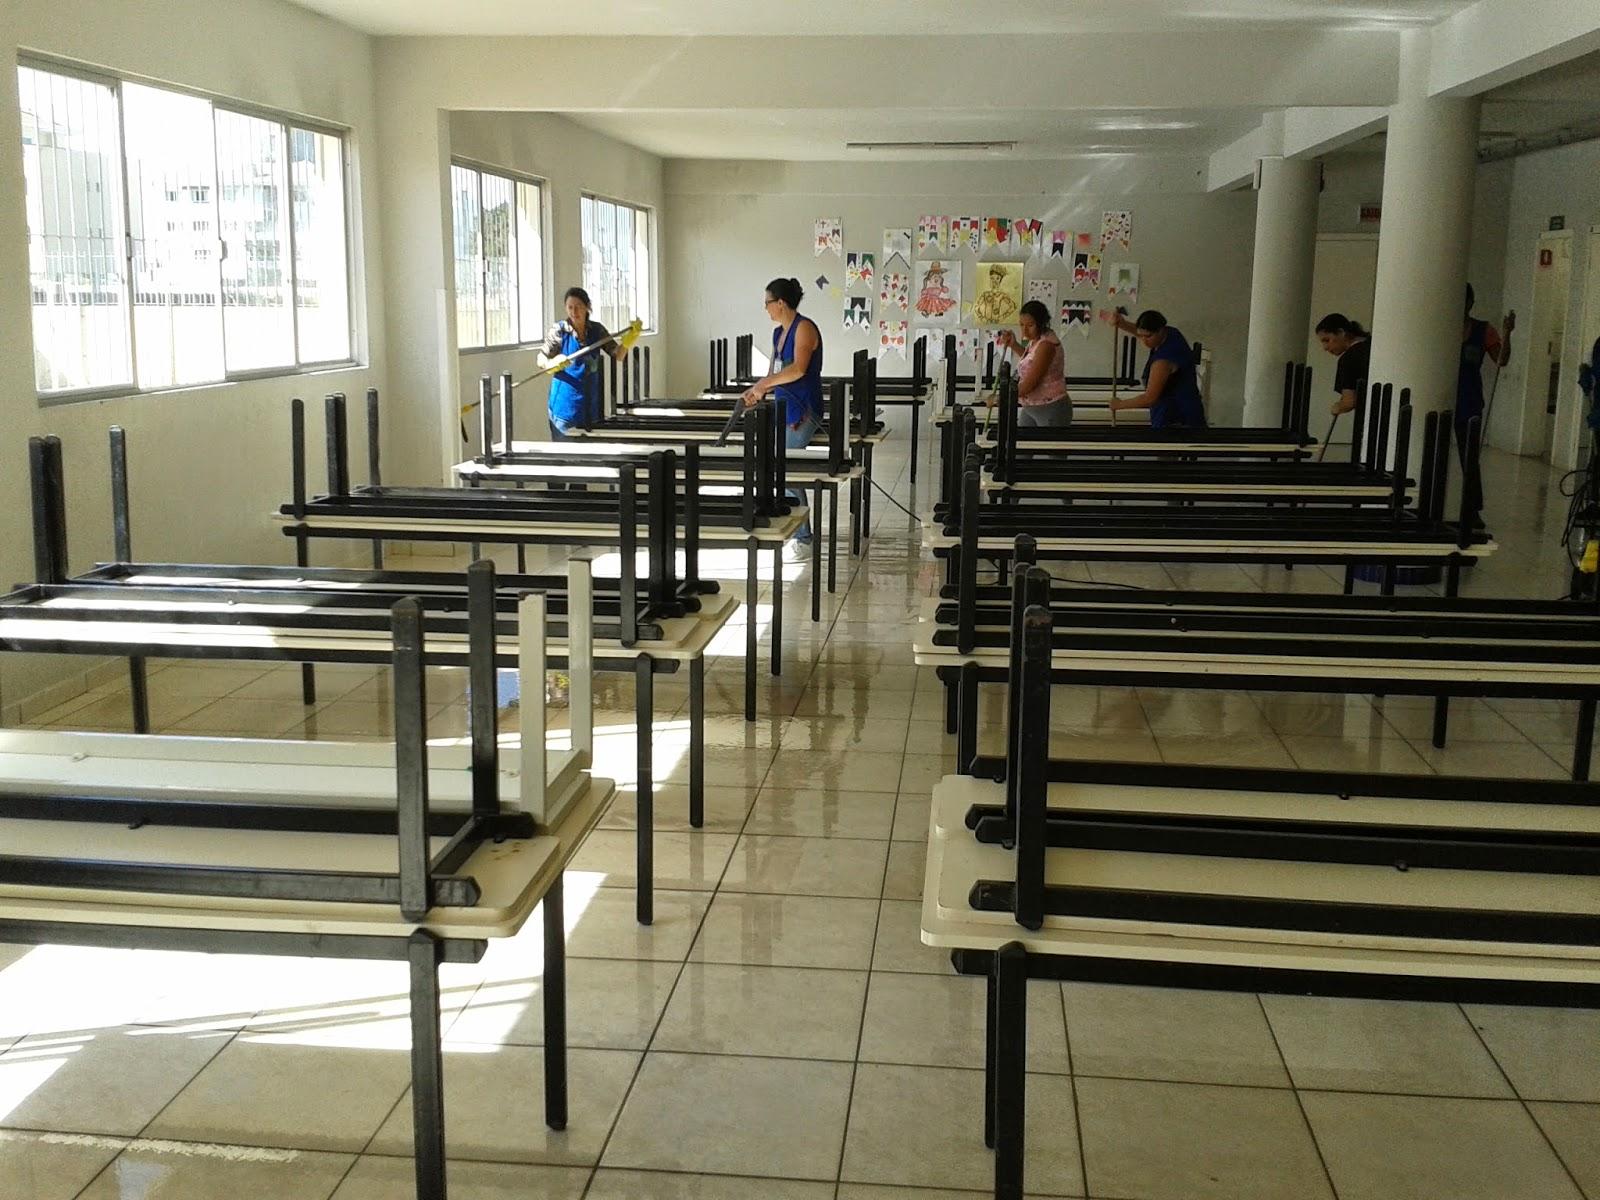 Escola Básica Prof.ª Herondina Medeiros Zeferino: Retorno das  #283D68 1600x1200 Armario Banheiro Rodizio